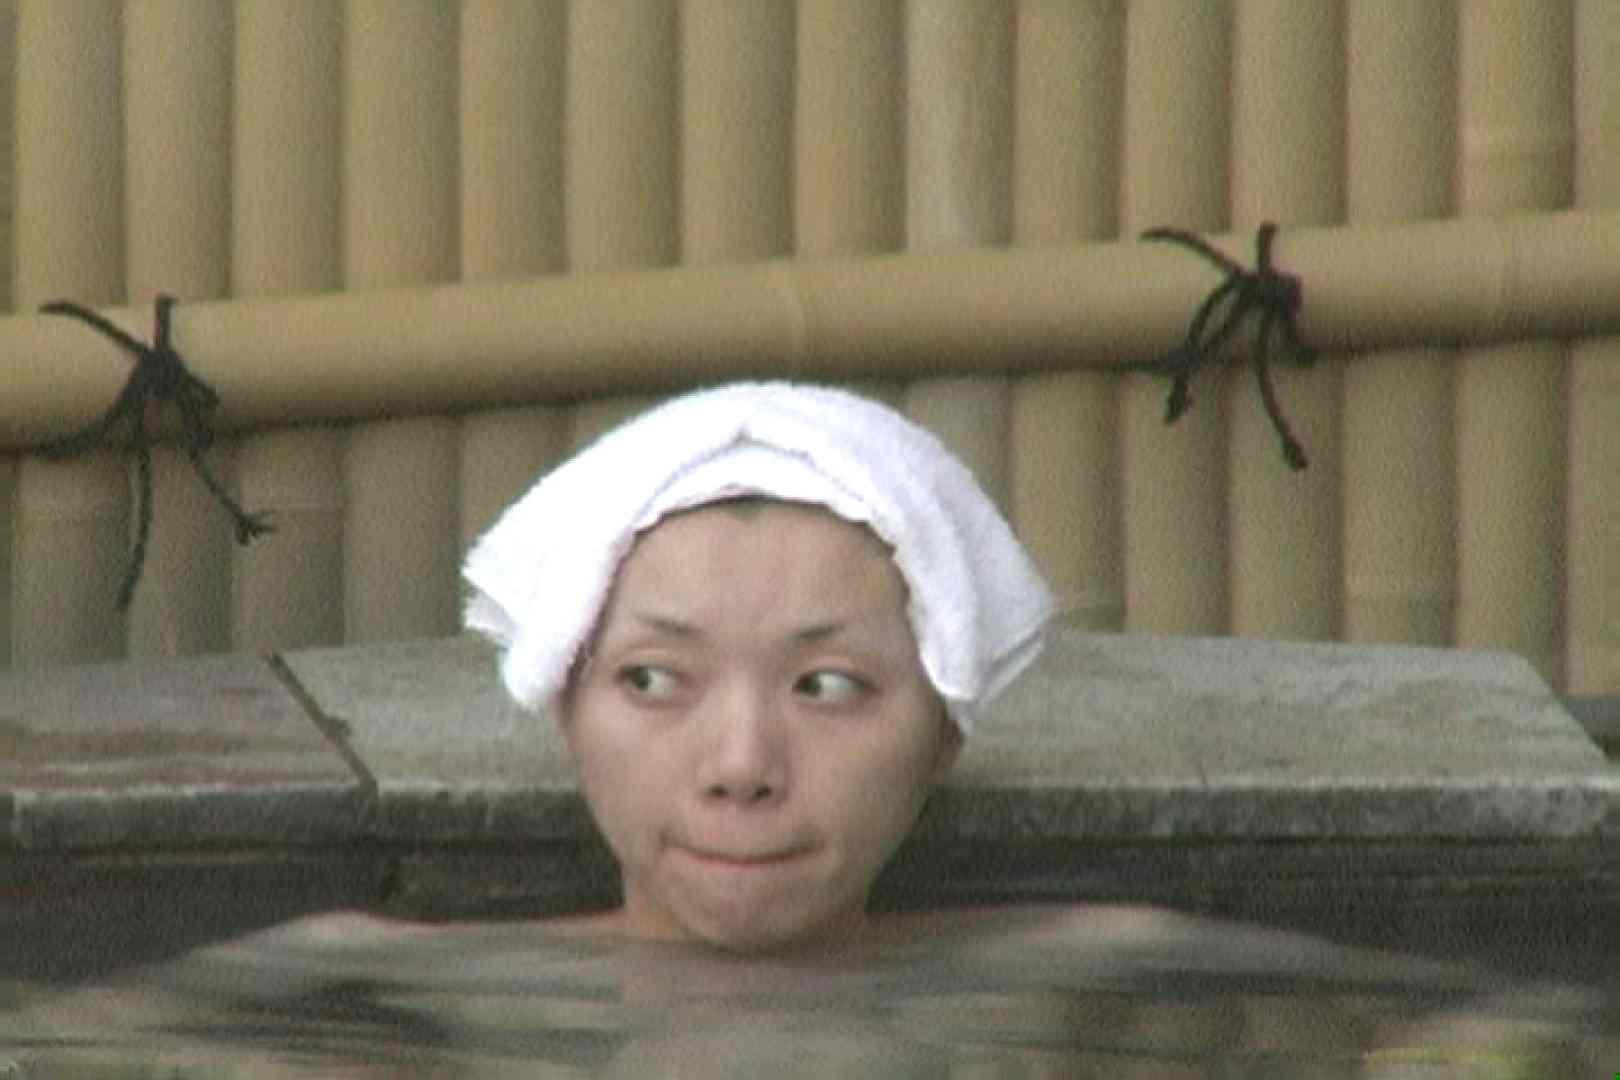 Aquaな露天風呂Vol.630 HなOL セックス無修正動画無料 87pic 46